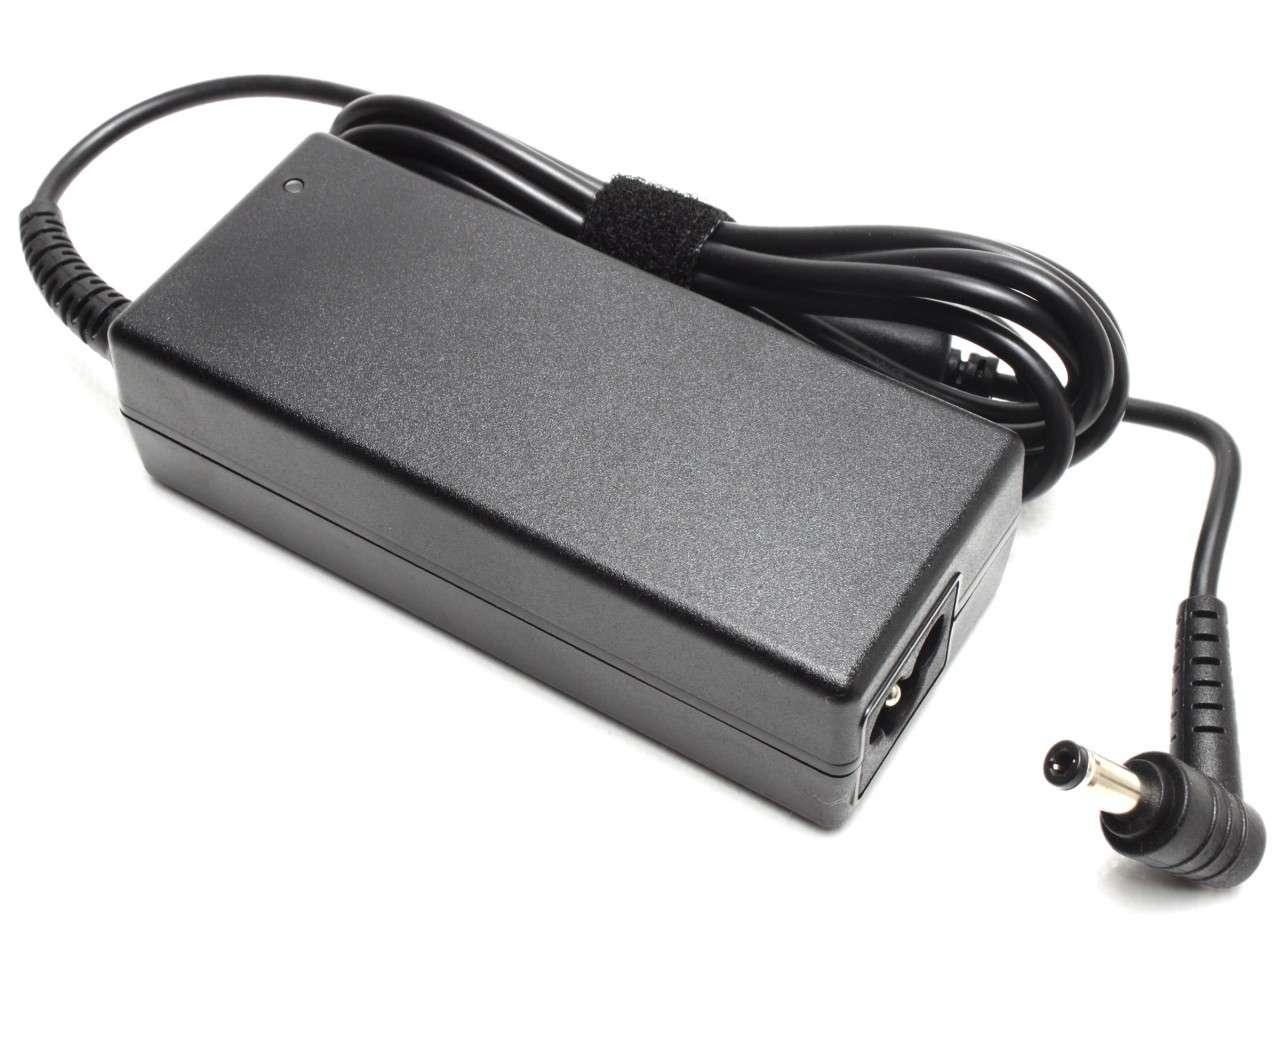 Incarcator Advent 6418XP imagine powerlaptop.ro 2021